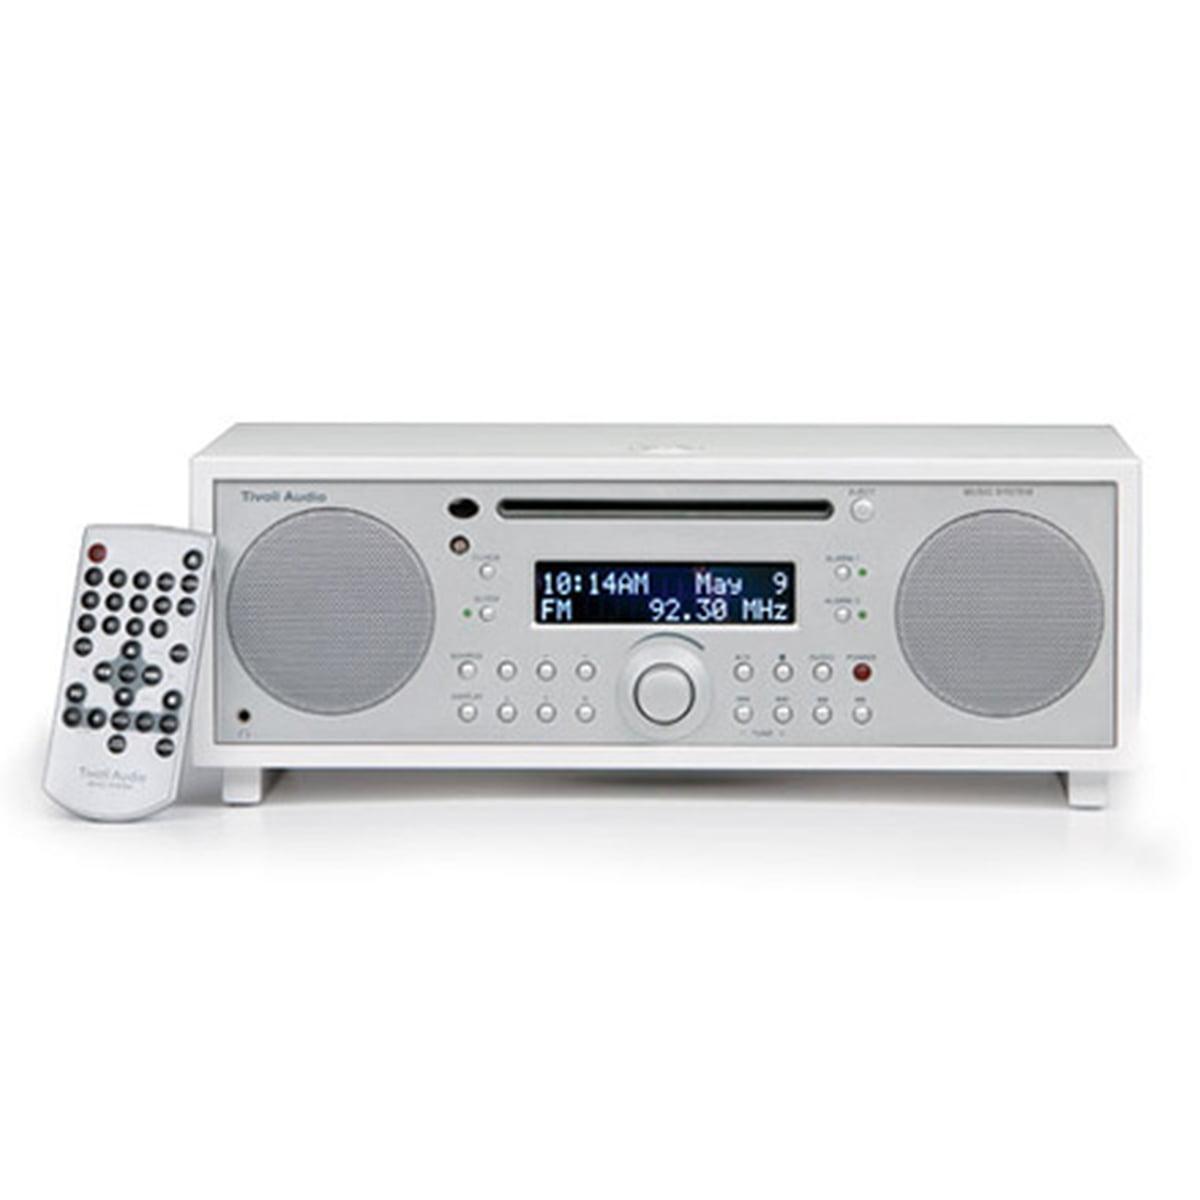 Tivoli Audio Music System+ in the shop